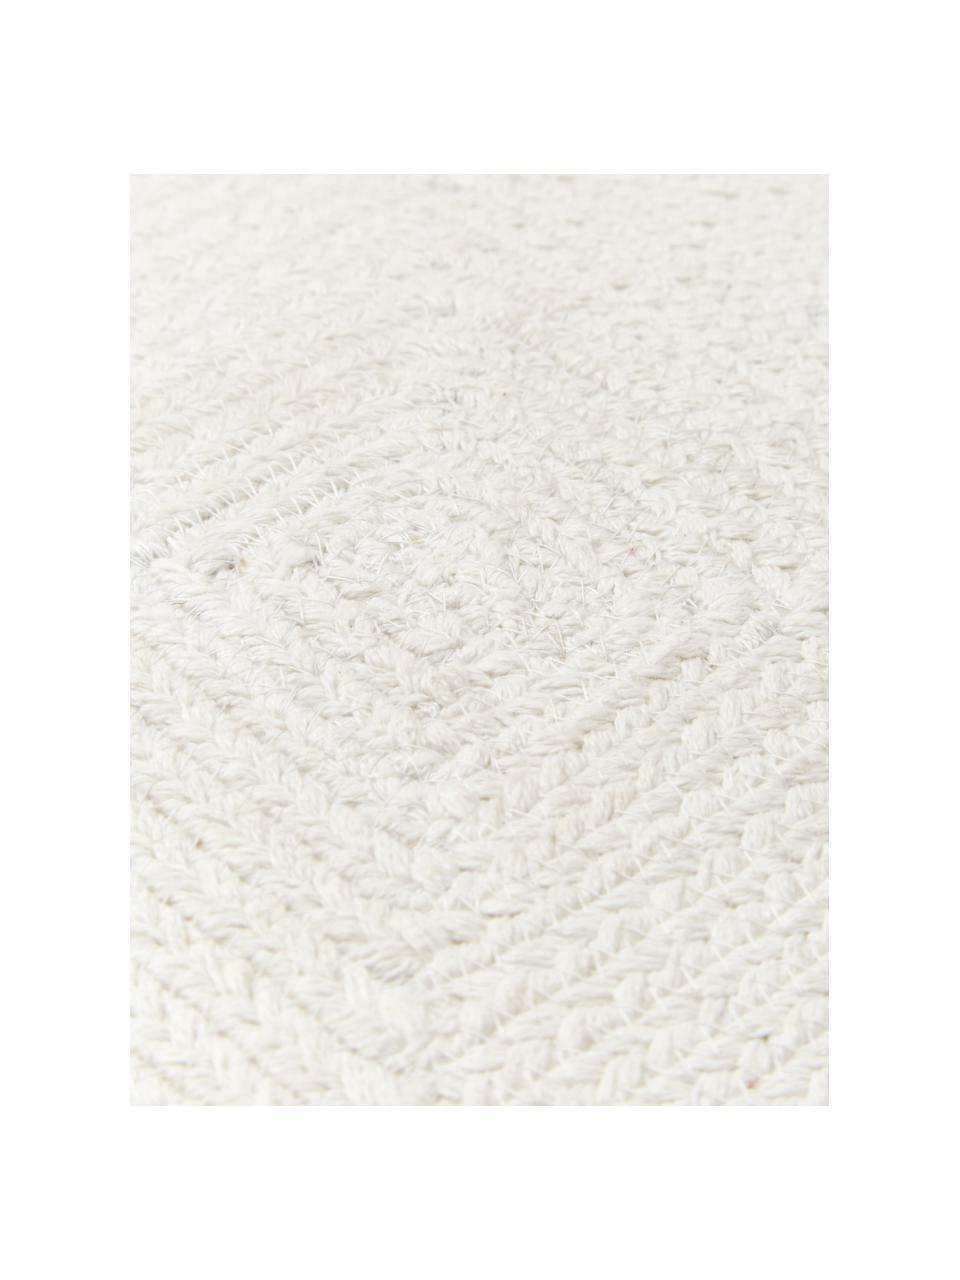 Kissenhülle Justina im Jutelook, 100% Baumwolle, Cremeweiß, 45 x 45 cm